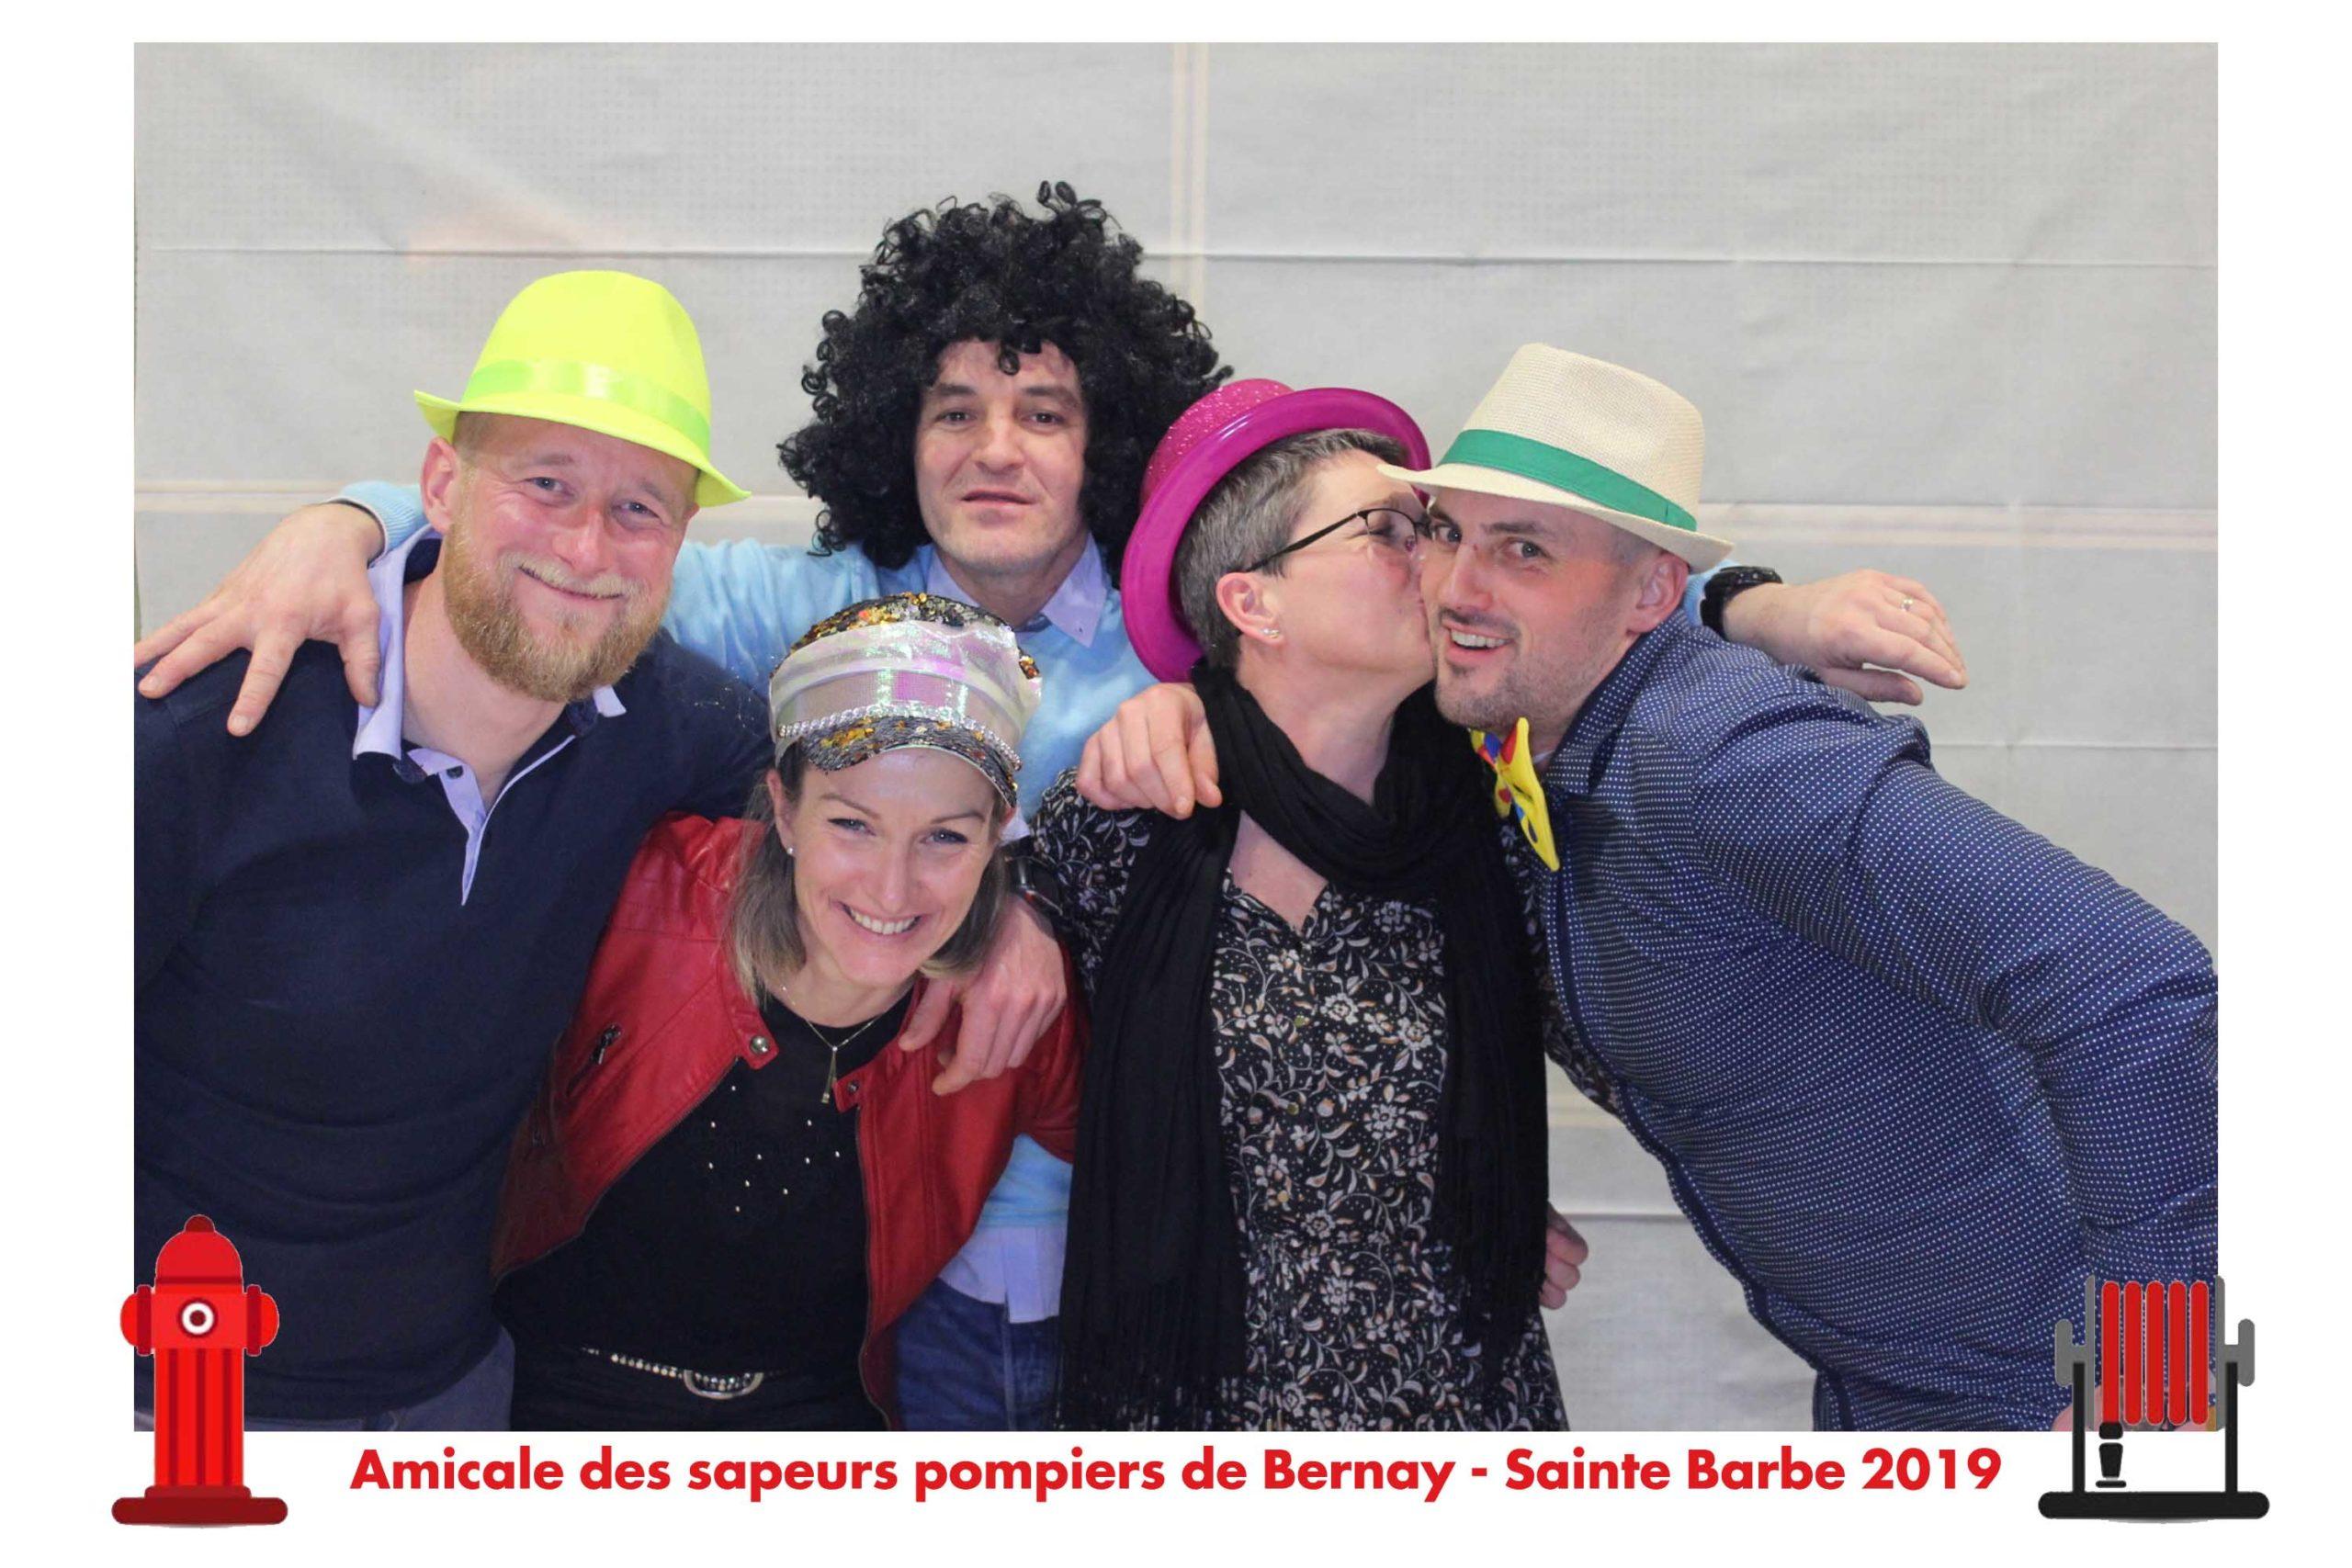 Protégé: Galerie photos – Sainte Barbe Pompiers Bernay 2019